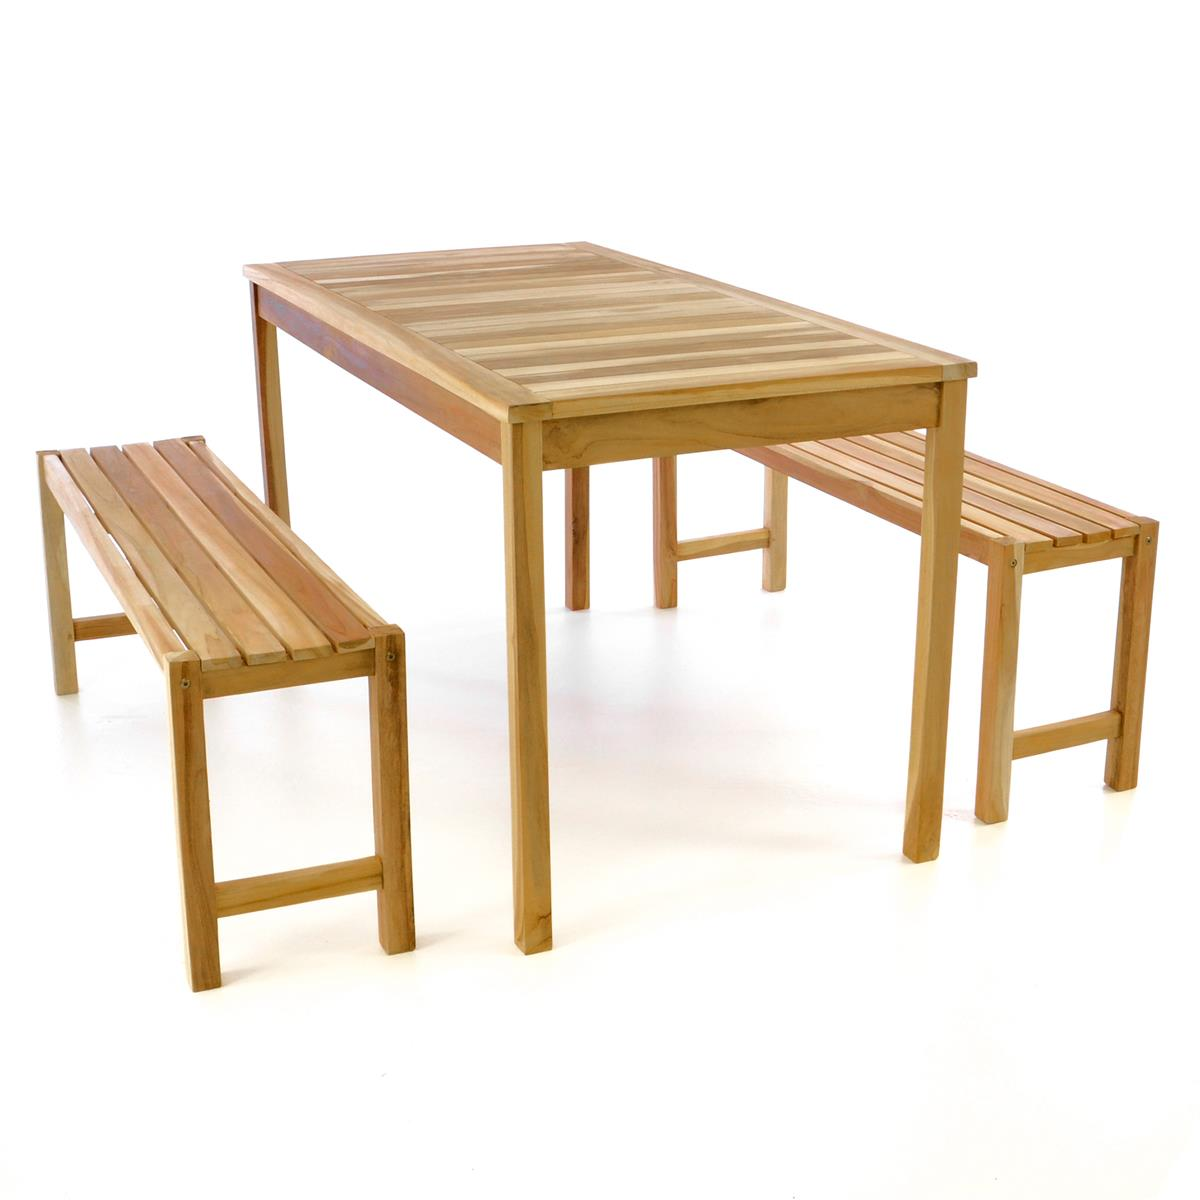 DIVERO Gartenmöbelset Picknickset Sitzgruppe natur Teakholz Bank Tisch 135cm